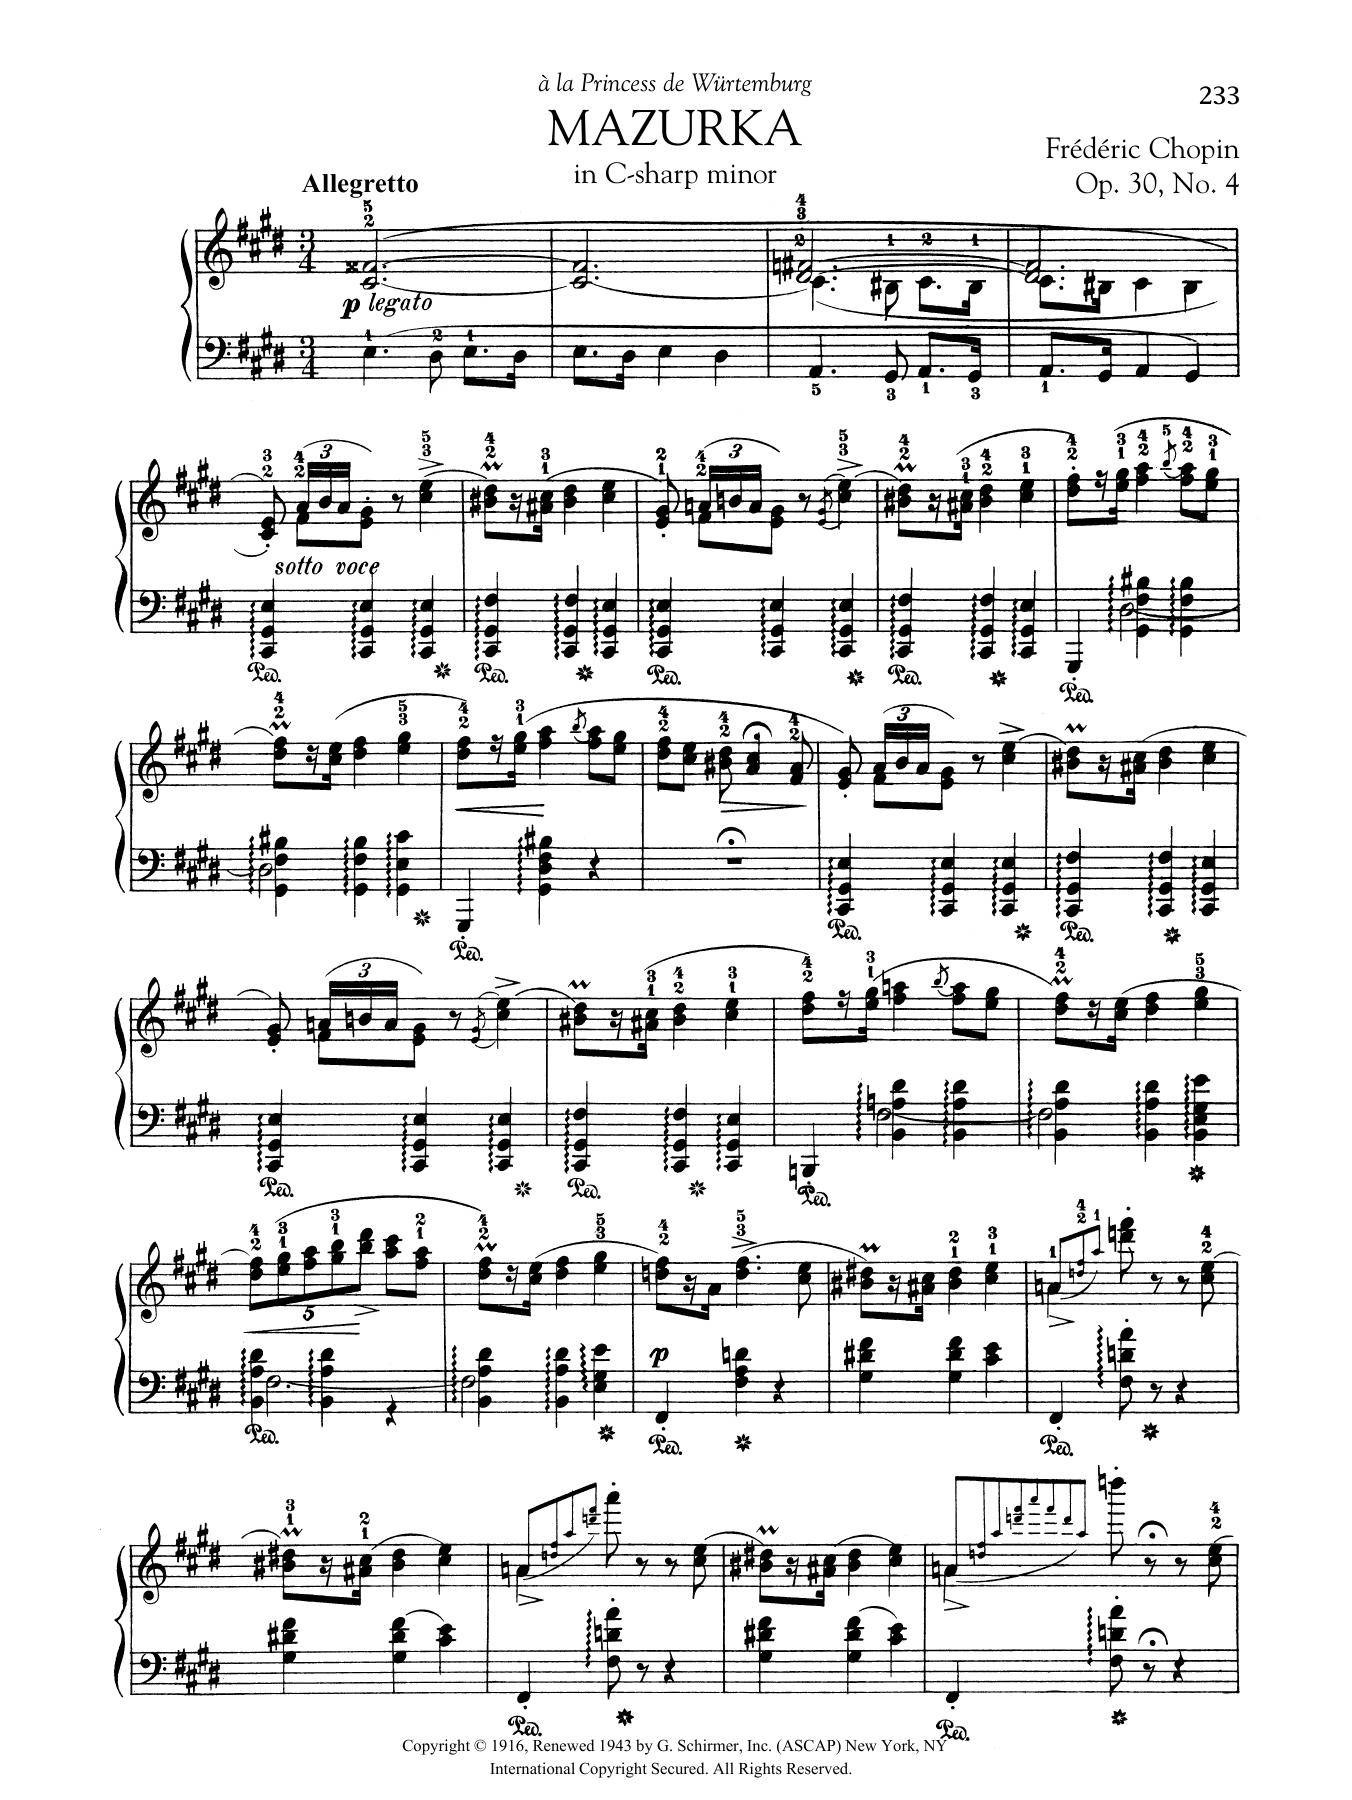 Mazurka in C-sharp minor, Op. 30, No. 4 Sheet Music